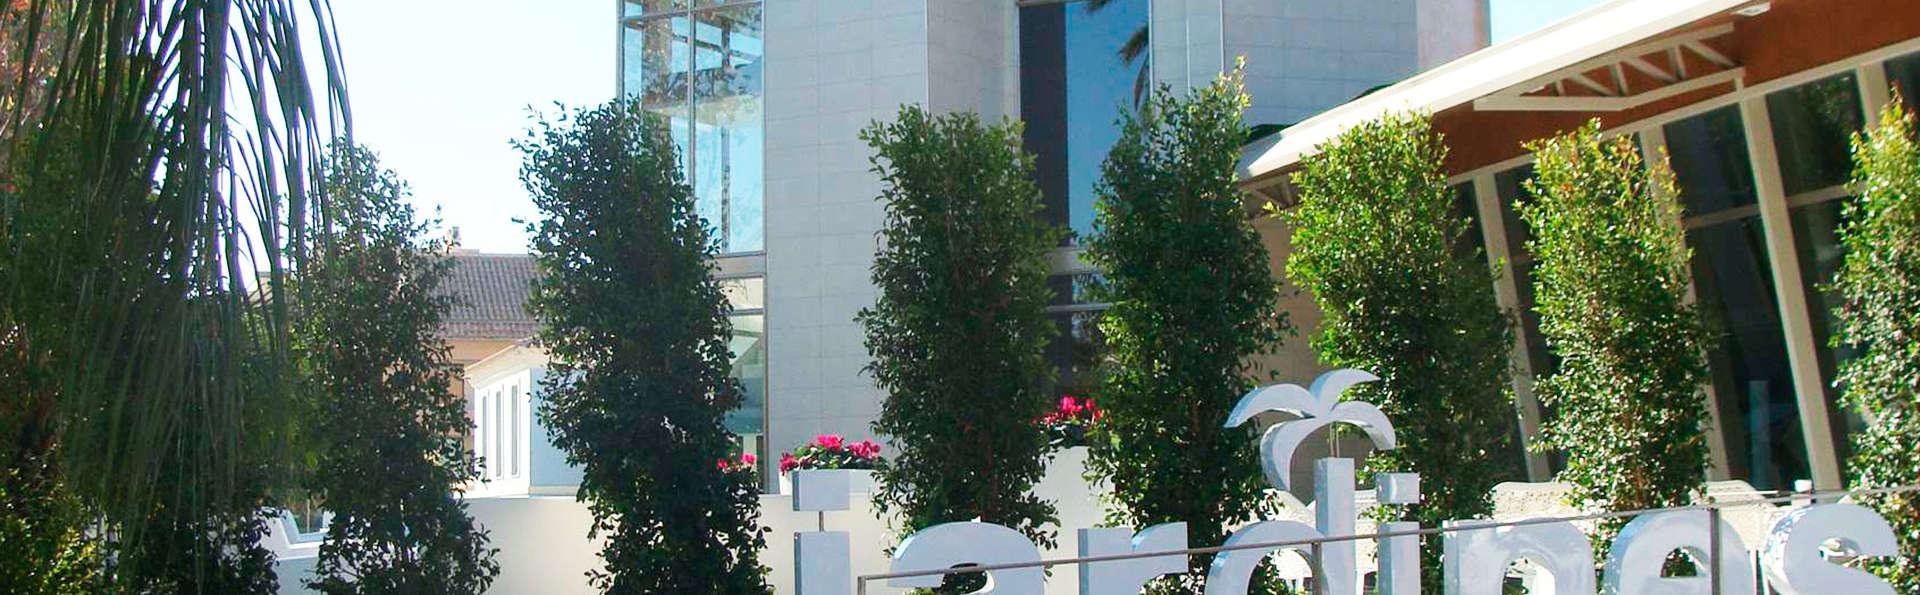 Hotel Spa Jardines de Lorca - EDIT_front.jpg